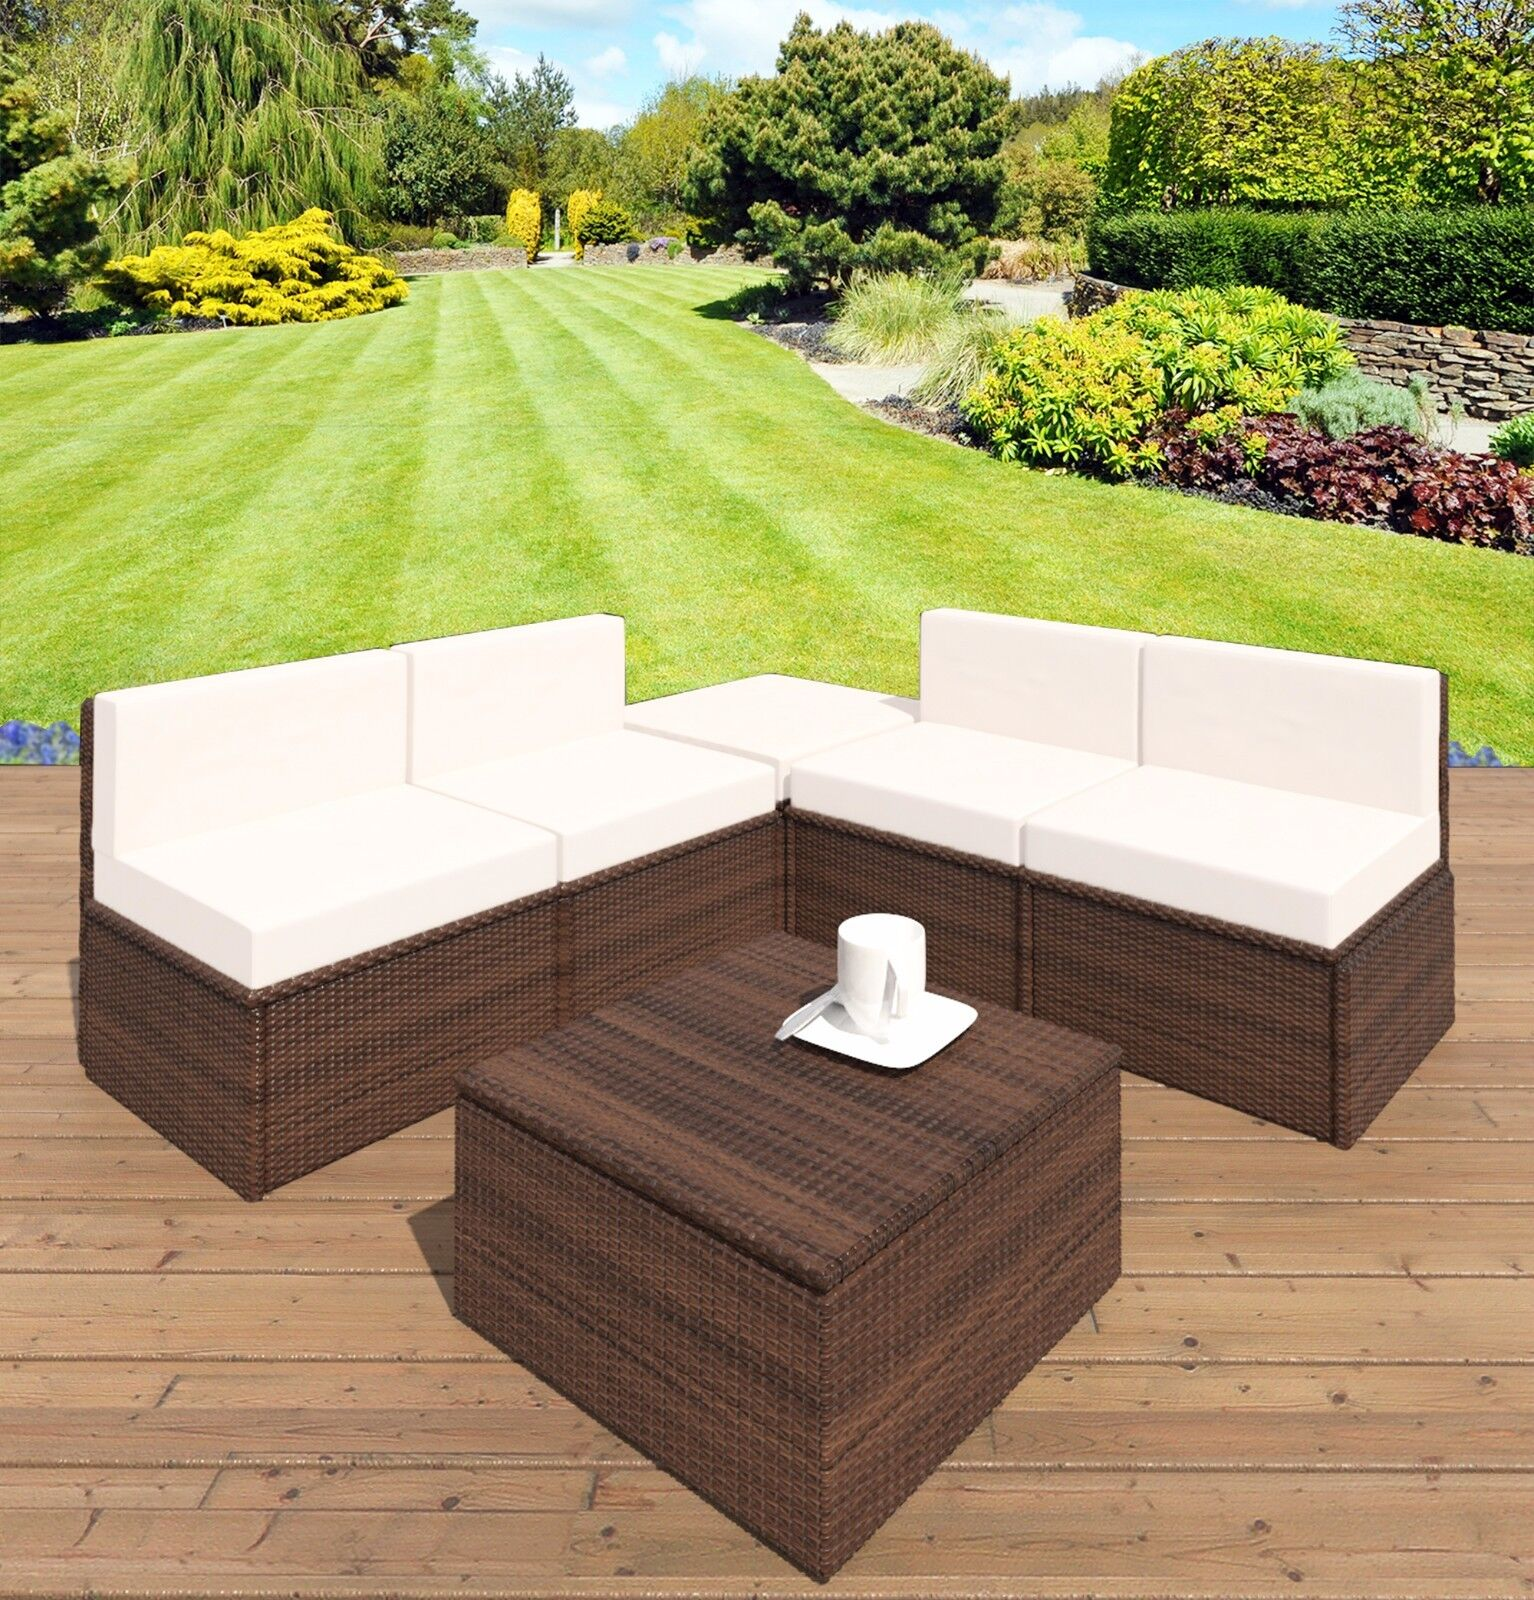 Garden Furniture - Brown Rattan Weave Garden Patio Balcony Furniture Lounge Chair Ottoman Footstool